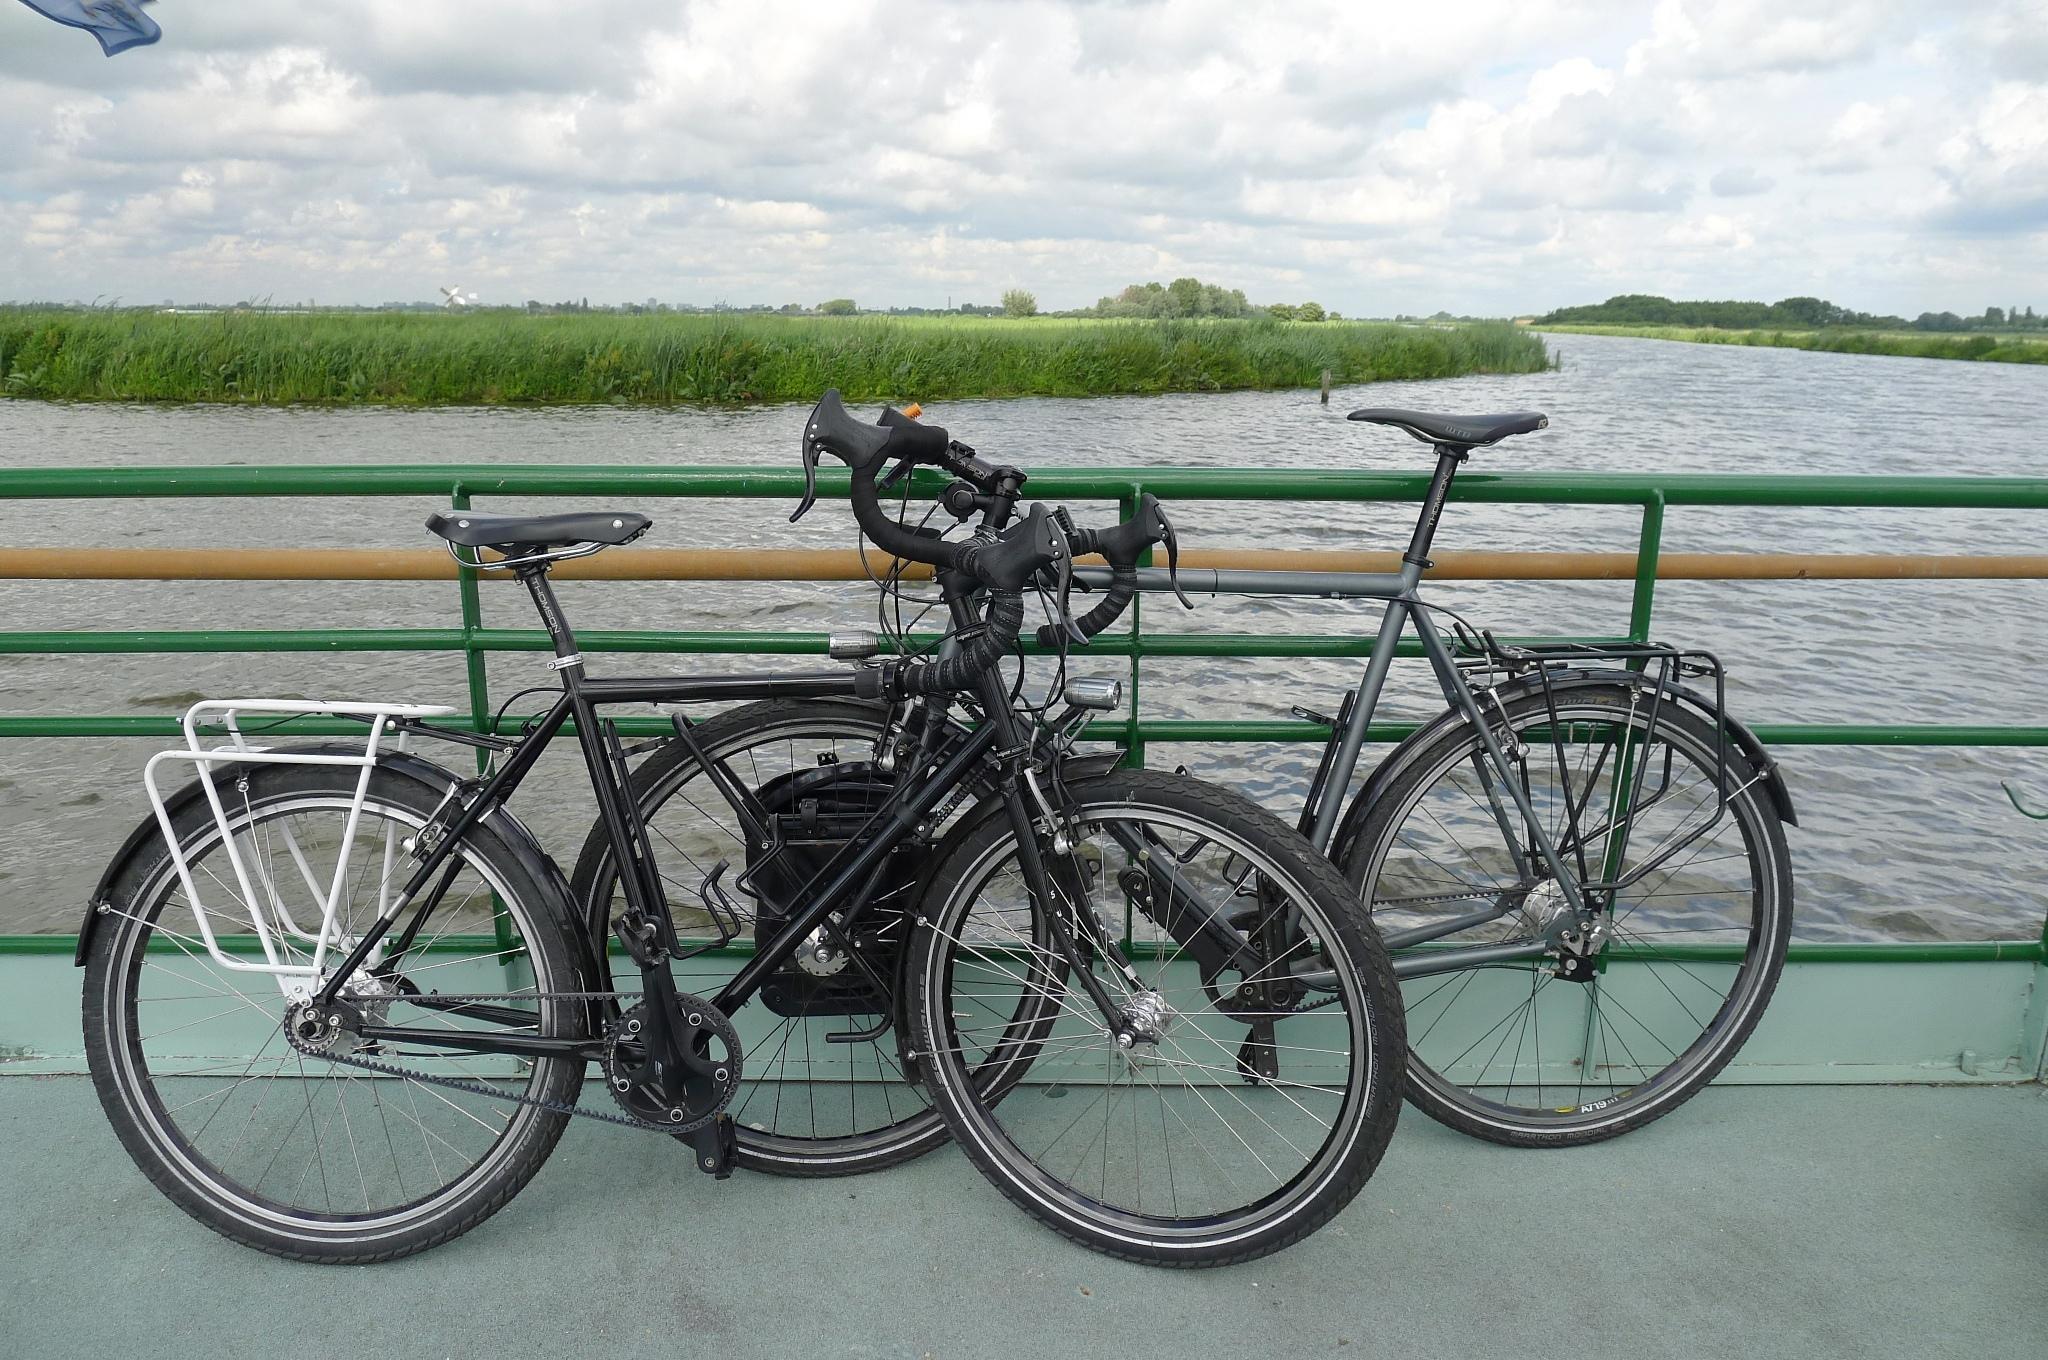 Alleykat_original bikes in Netherlands